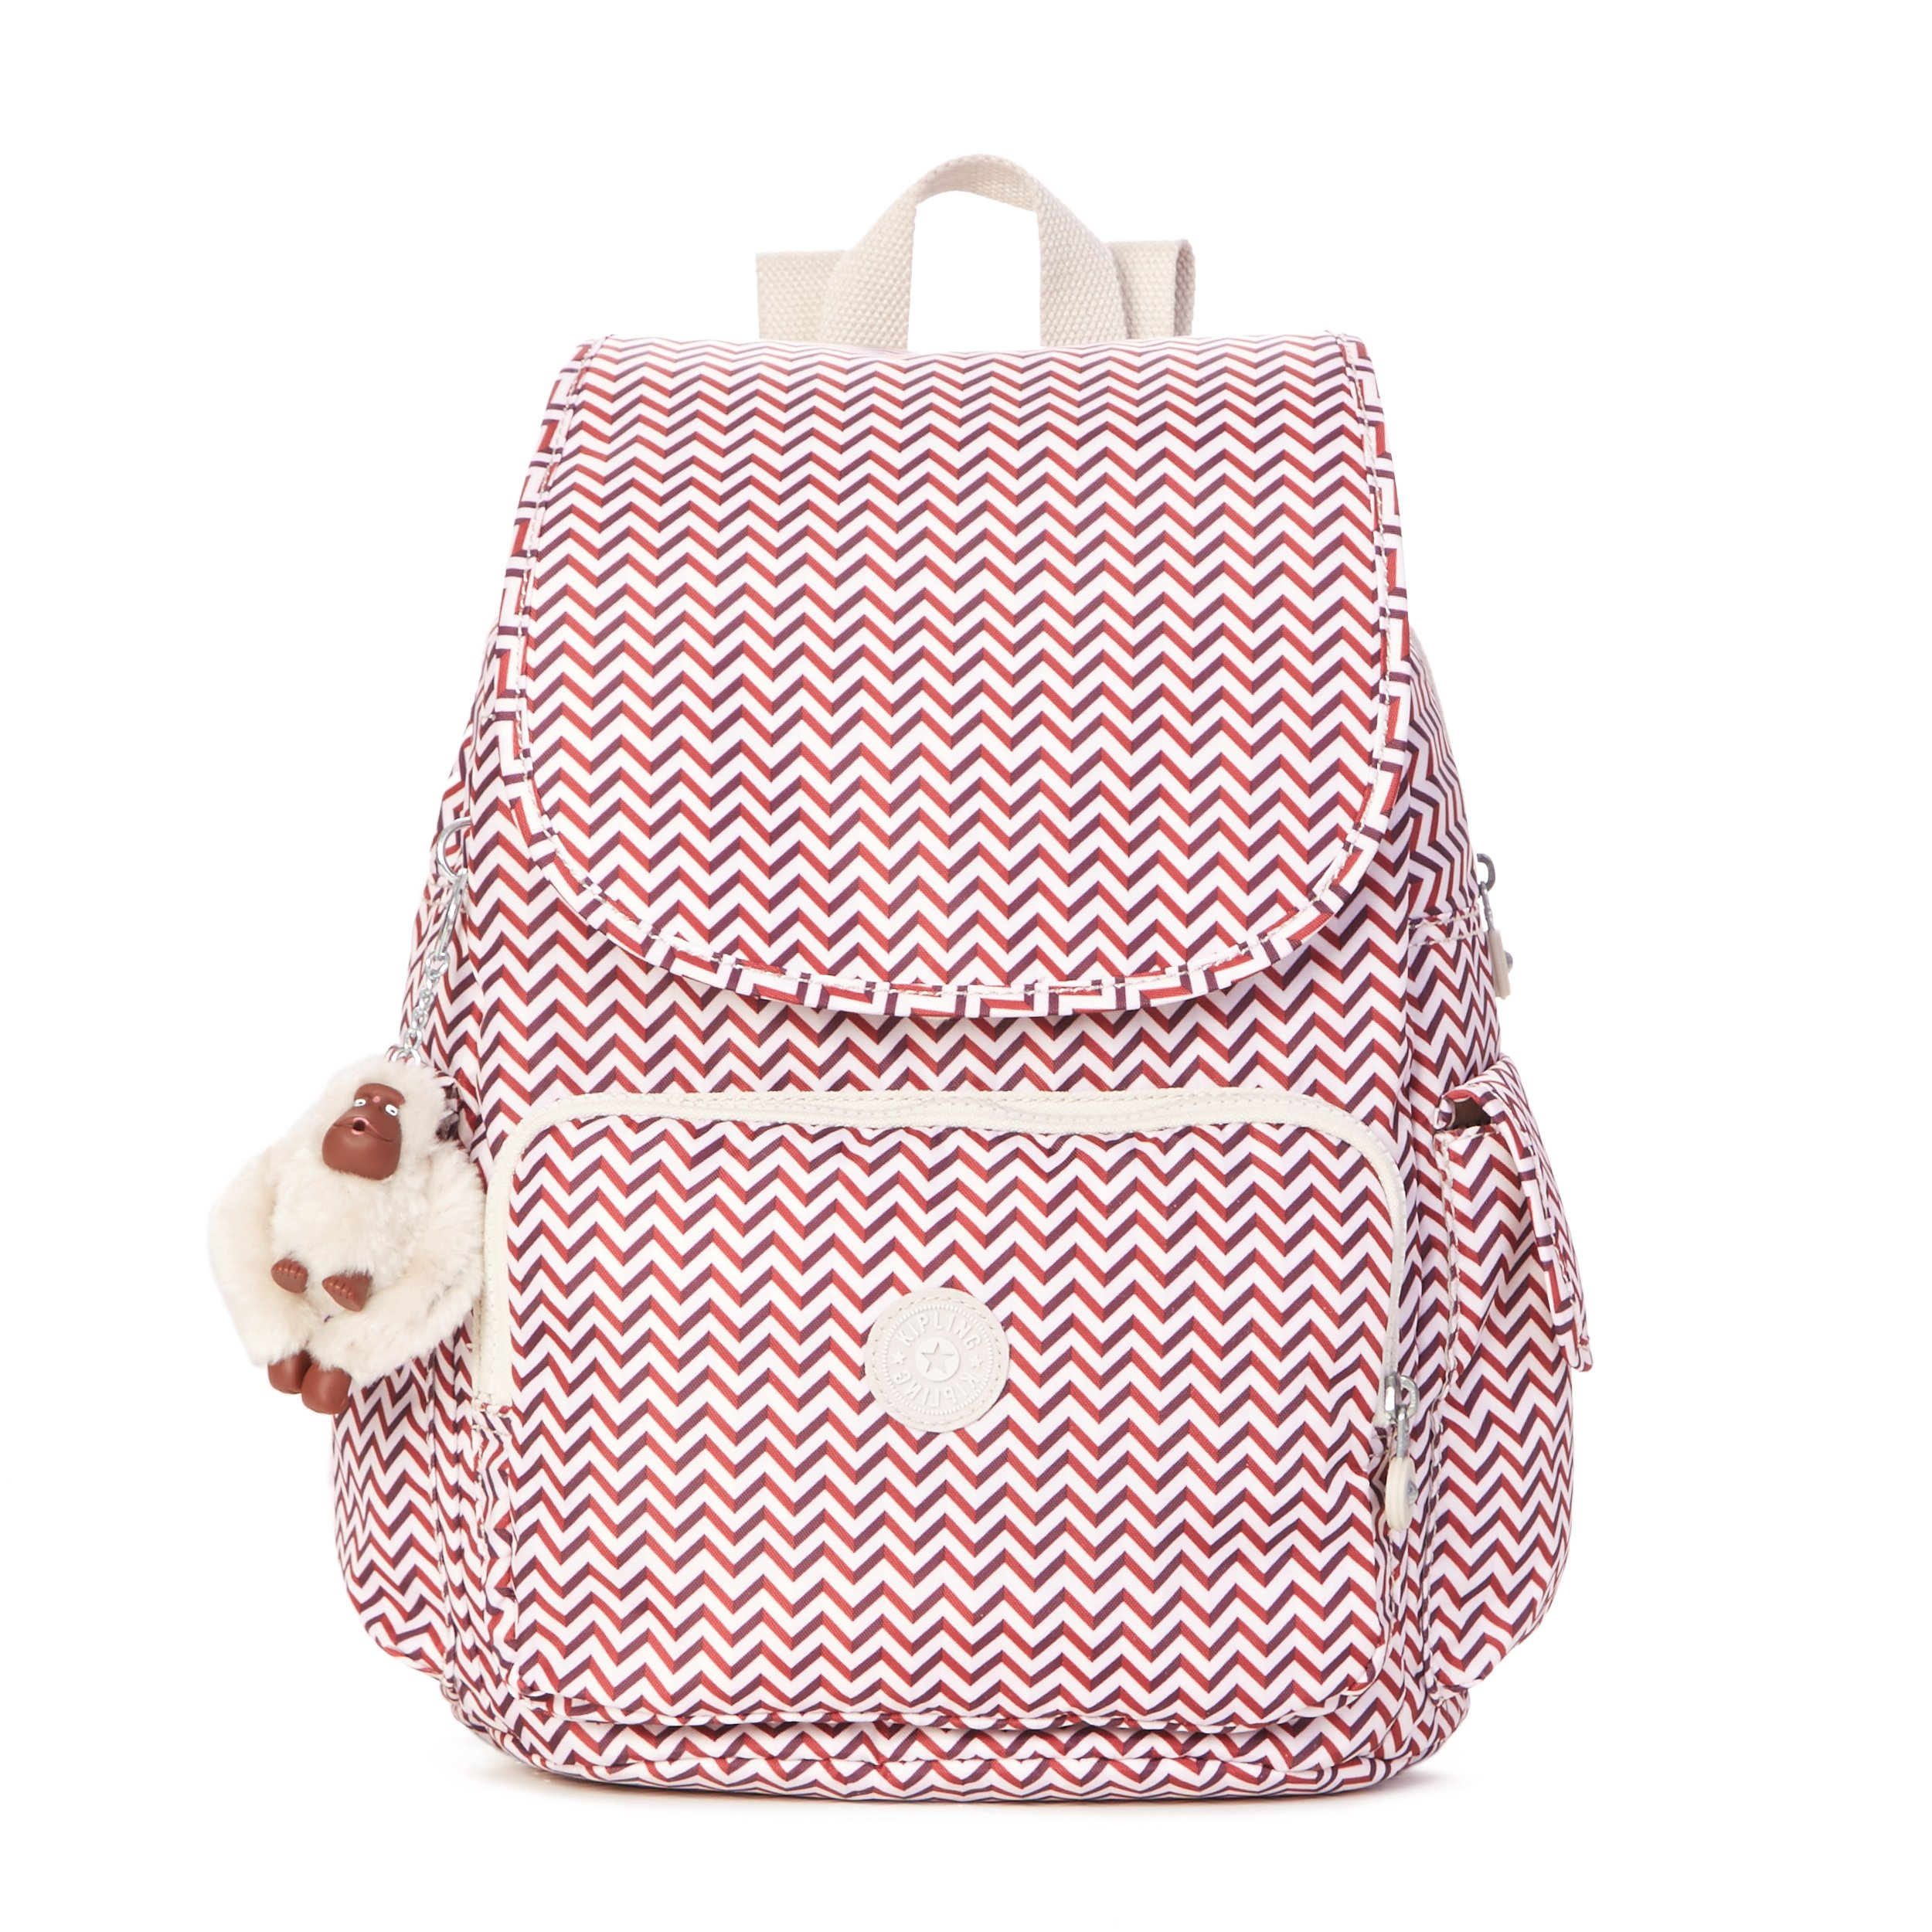 Kipling Women's Ravier Medium Solid Backpack, Zest Red by Kipling